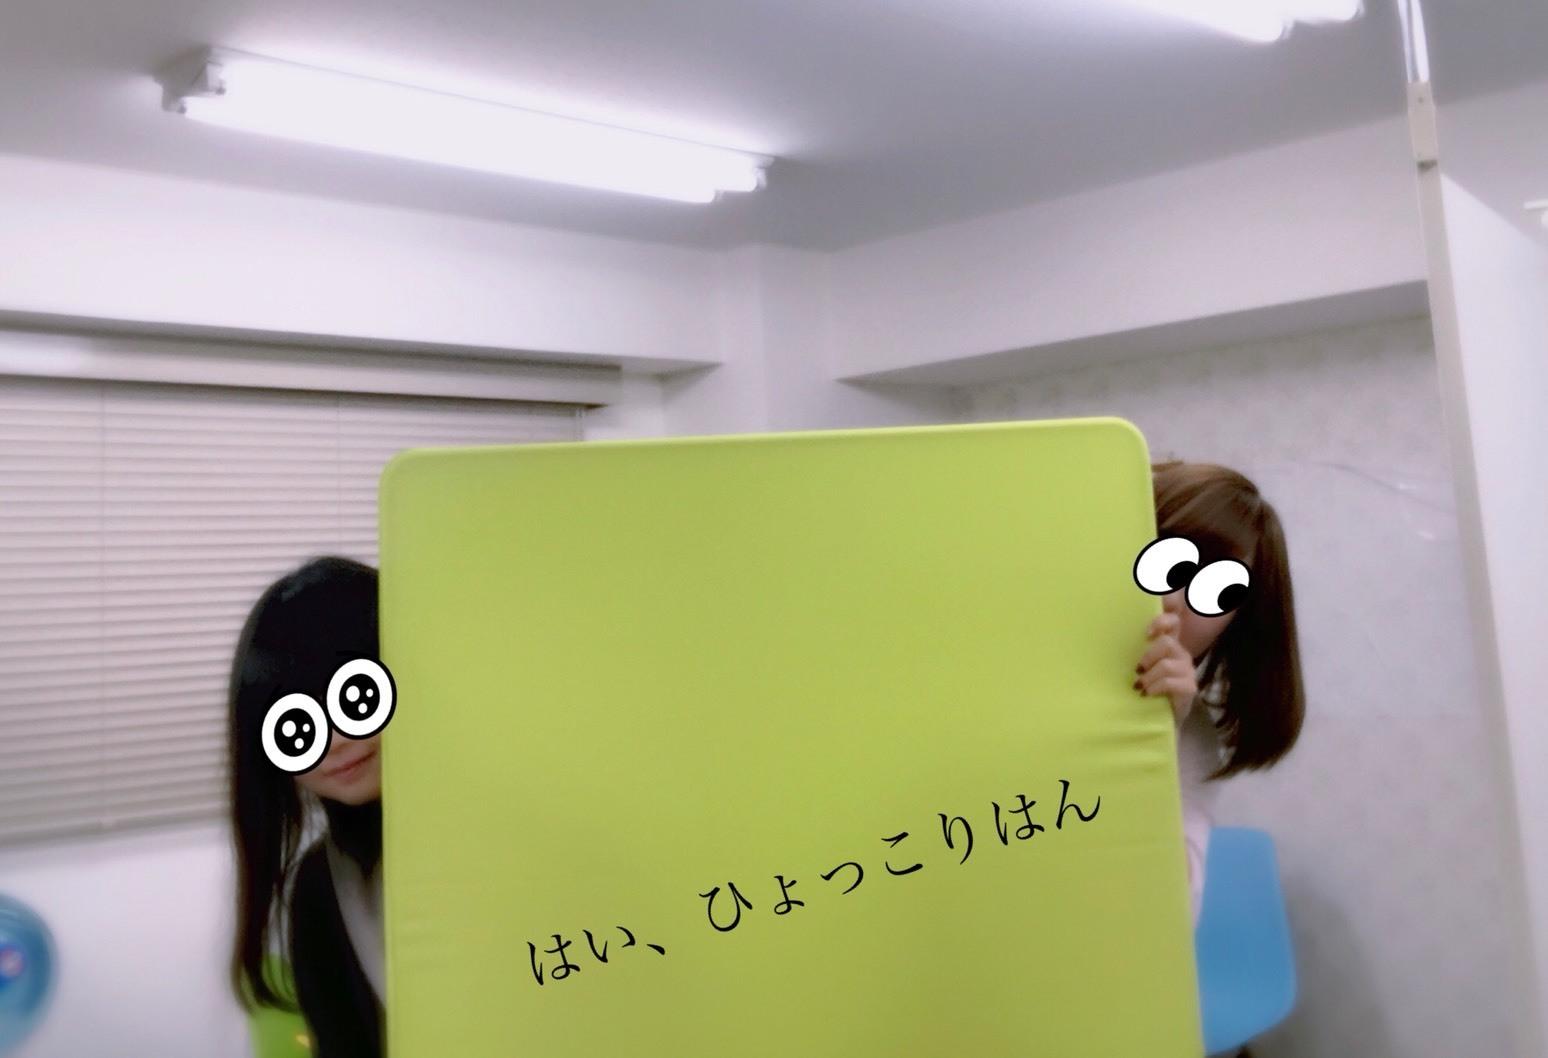 S__26402826.jpg